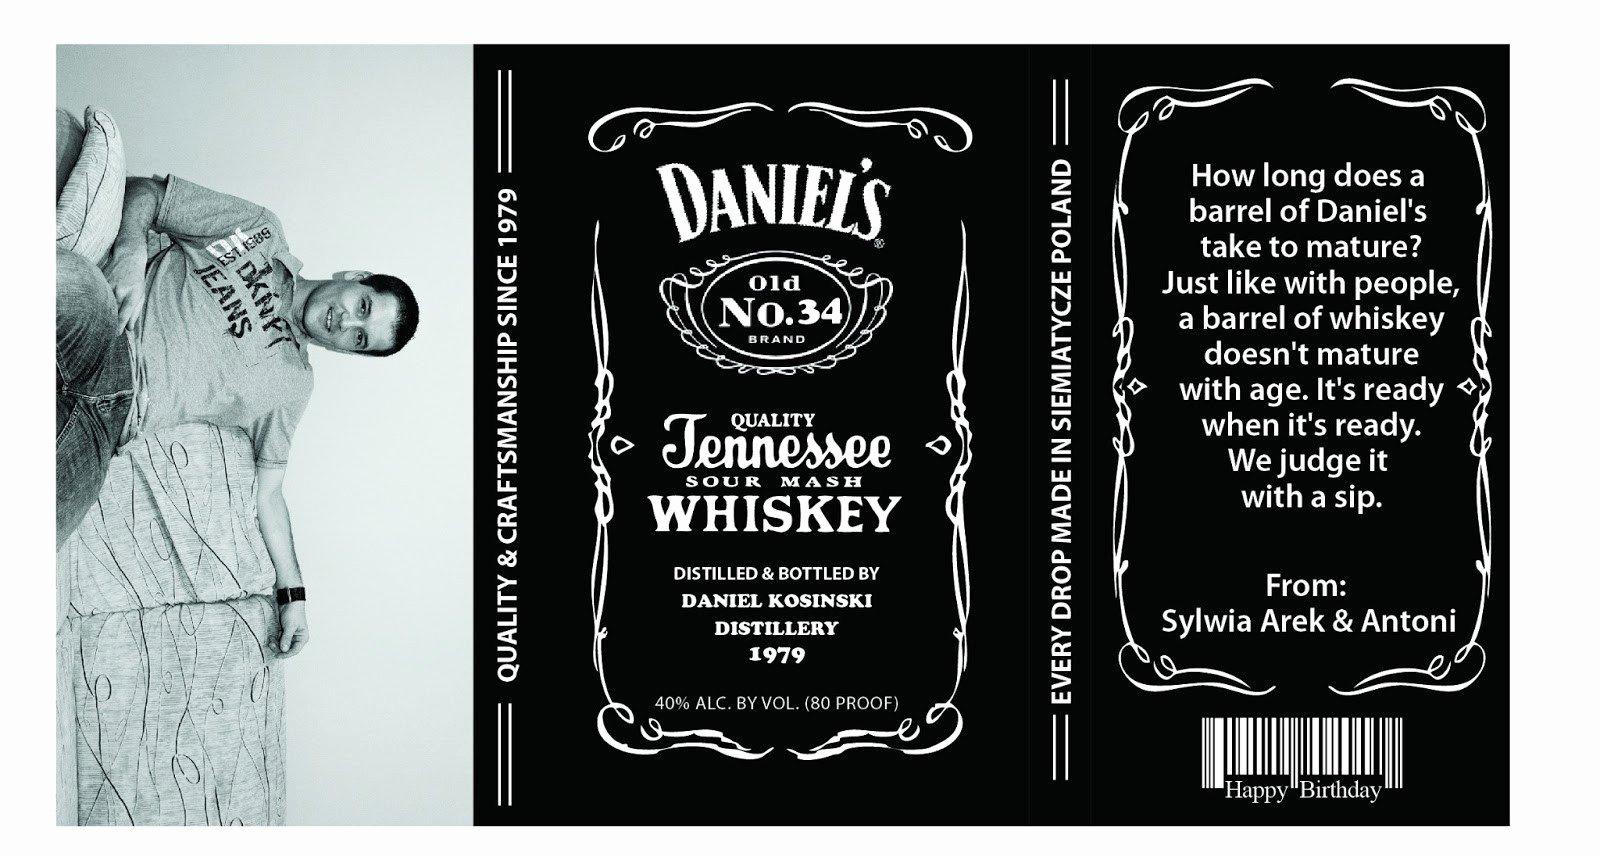 Free Jack Daniels Label Template Luxury 13 Einzigartig Jack Daniels Etikett Vorlage Robert Cv